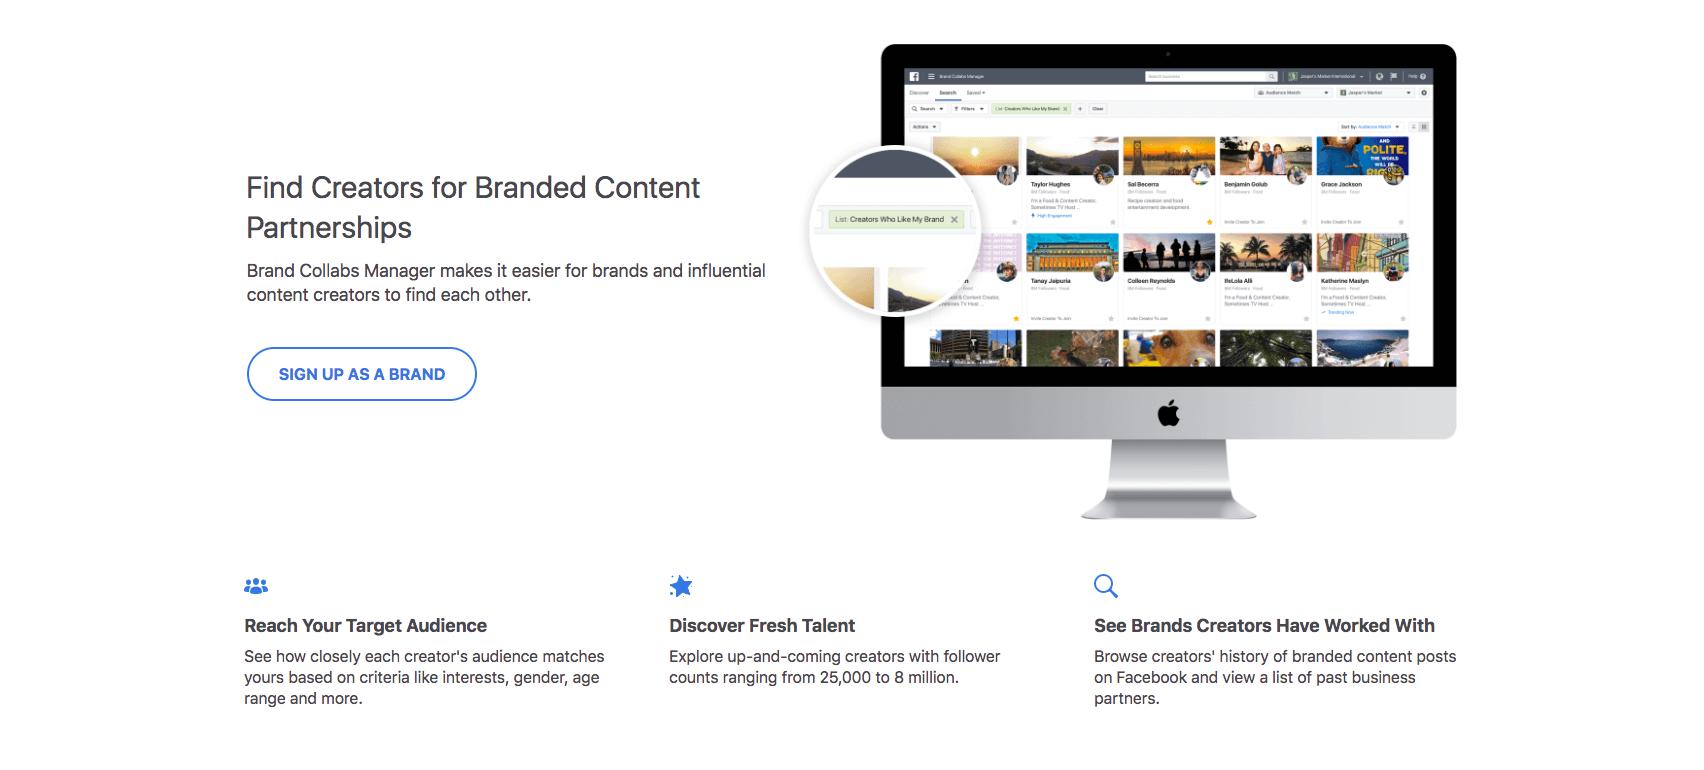 Brand Collabs Manager - έμαθες για τη νέα πλατφόρμα του Facebook;